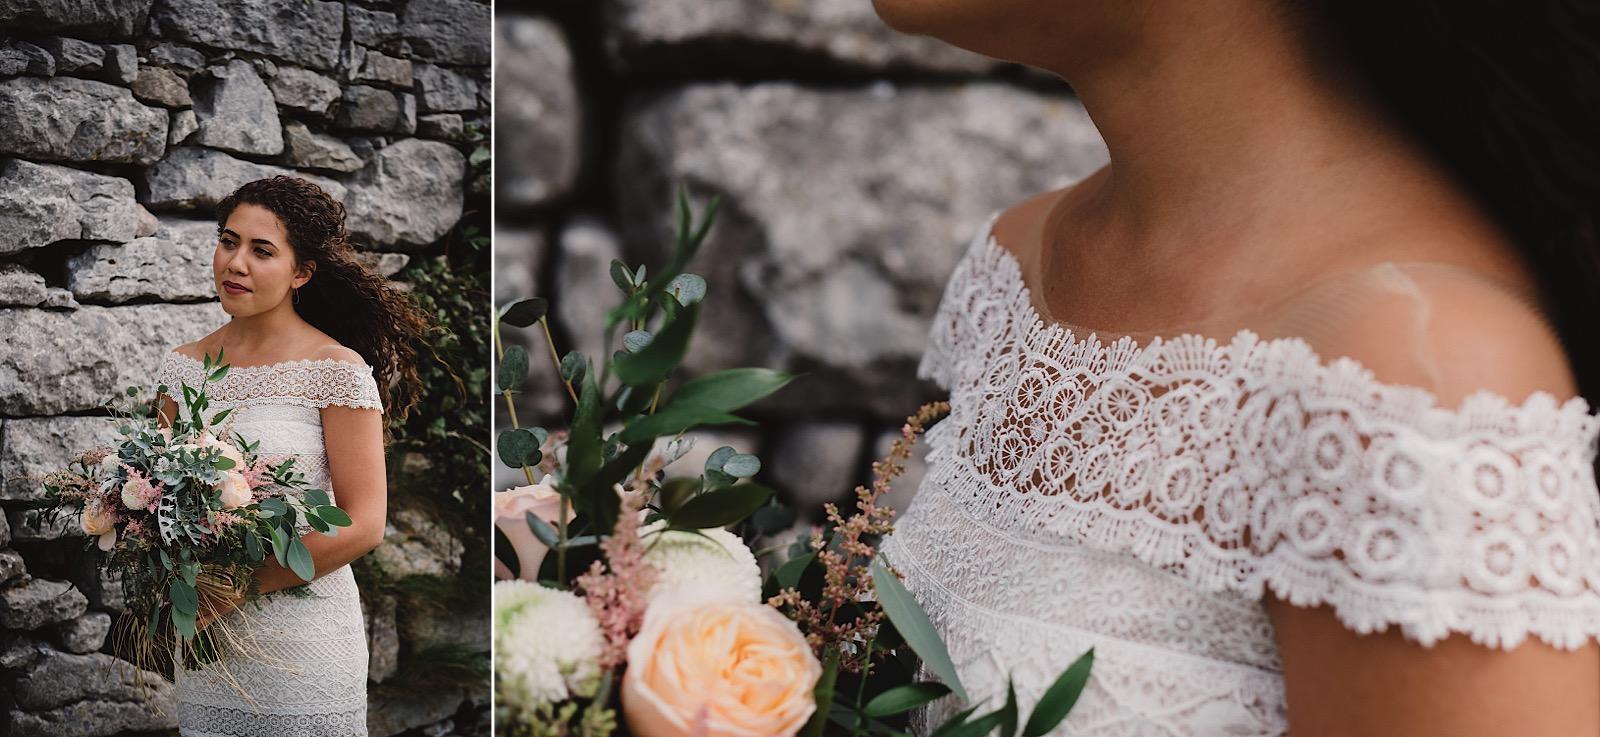 Elopement_Wedding_Ireland_Cliffs_of_moher0008